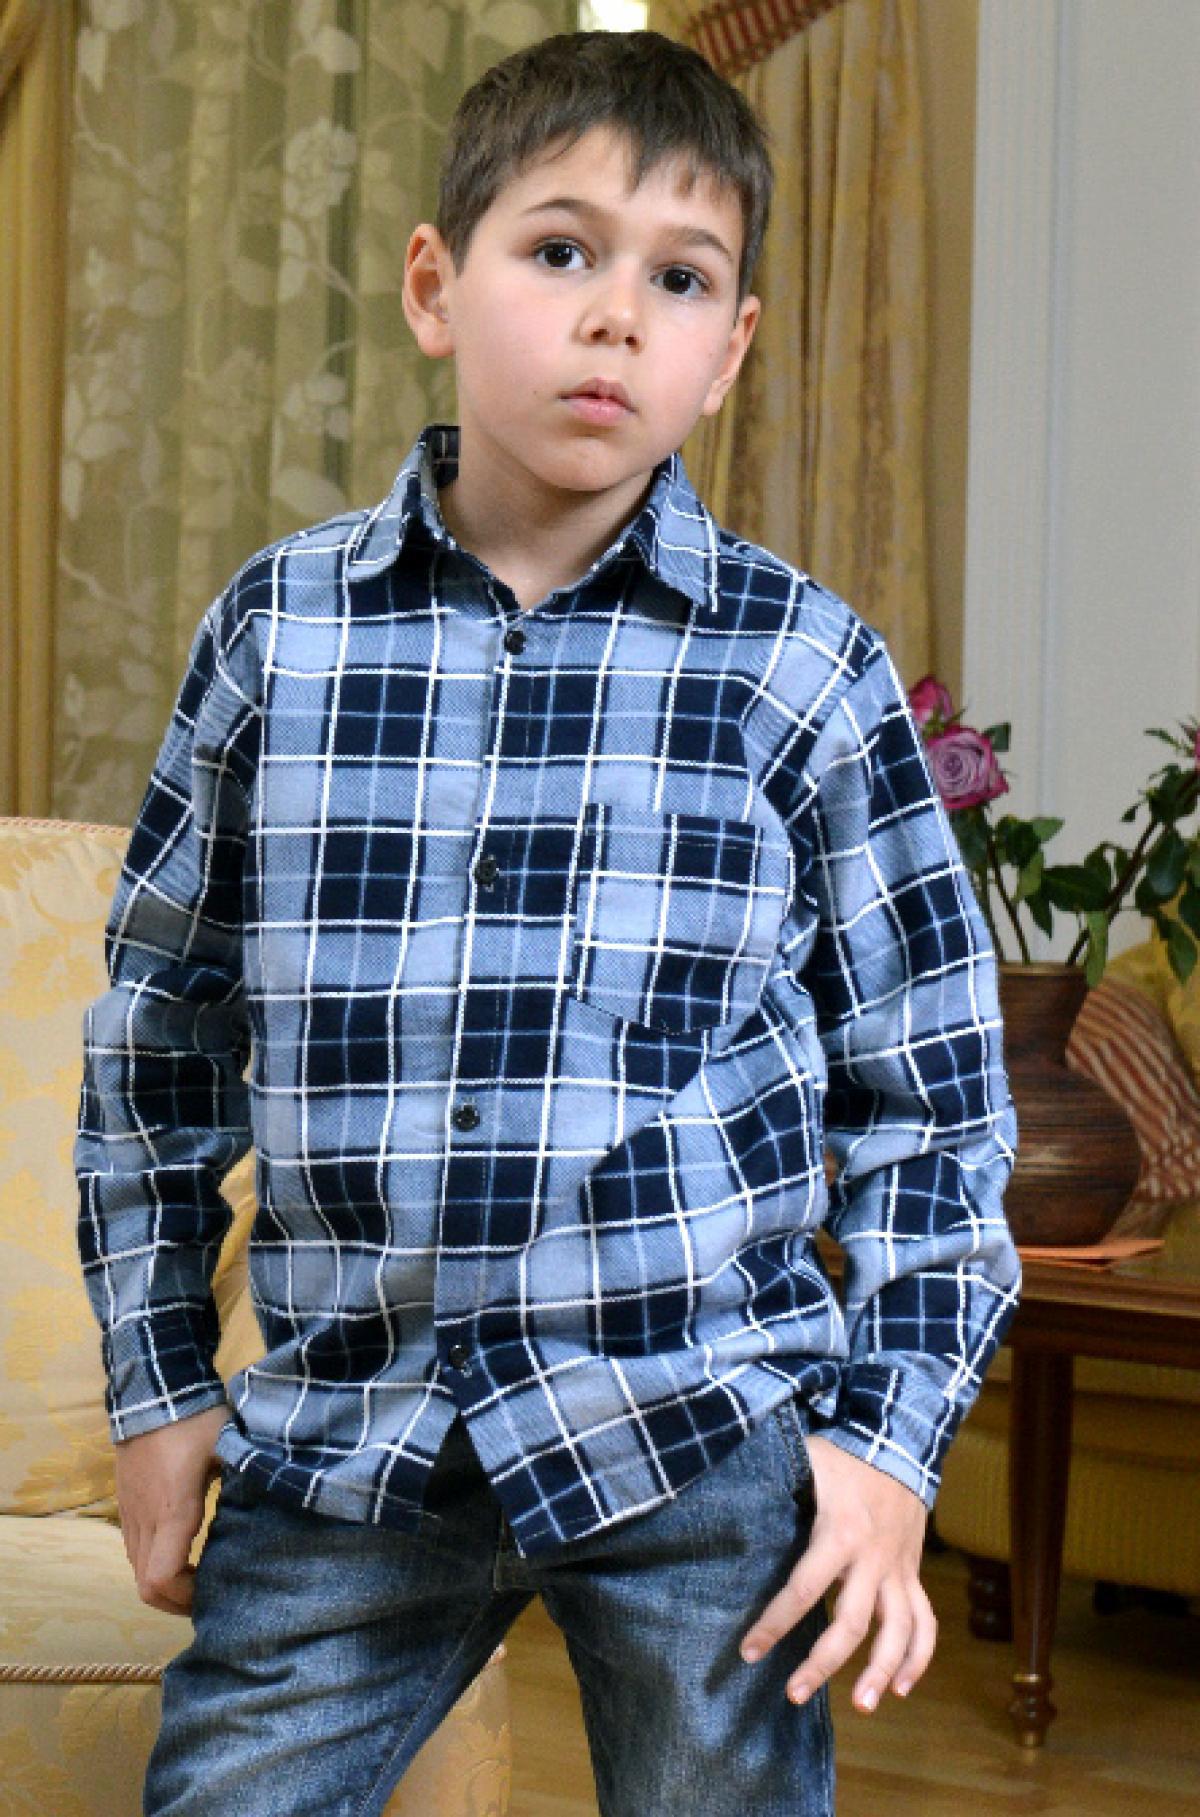 Дет. рубашка арт. 18-0091 р. 34Толстовки, джемпера и рубашки<br><br><br>Тип: Дет. рубашка<br>Размер: 34<br>Материал: Фланель